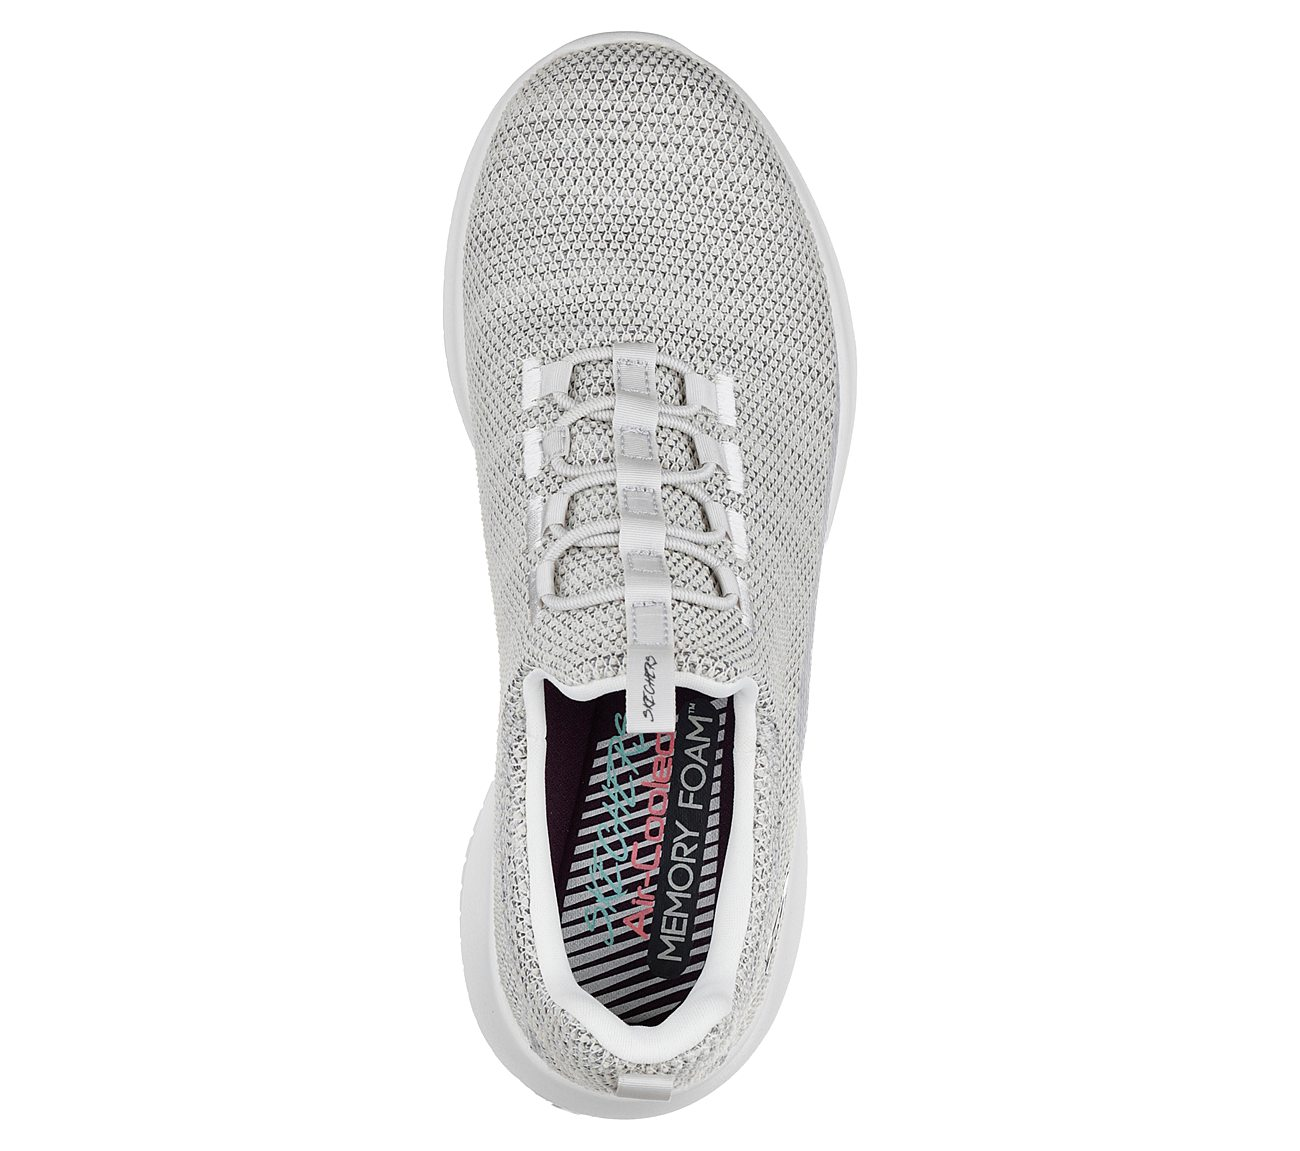 SKECHERS Ultra Flex - Capsule Sport Shoes